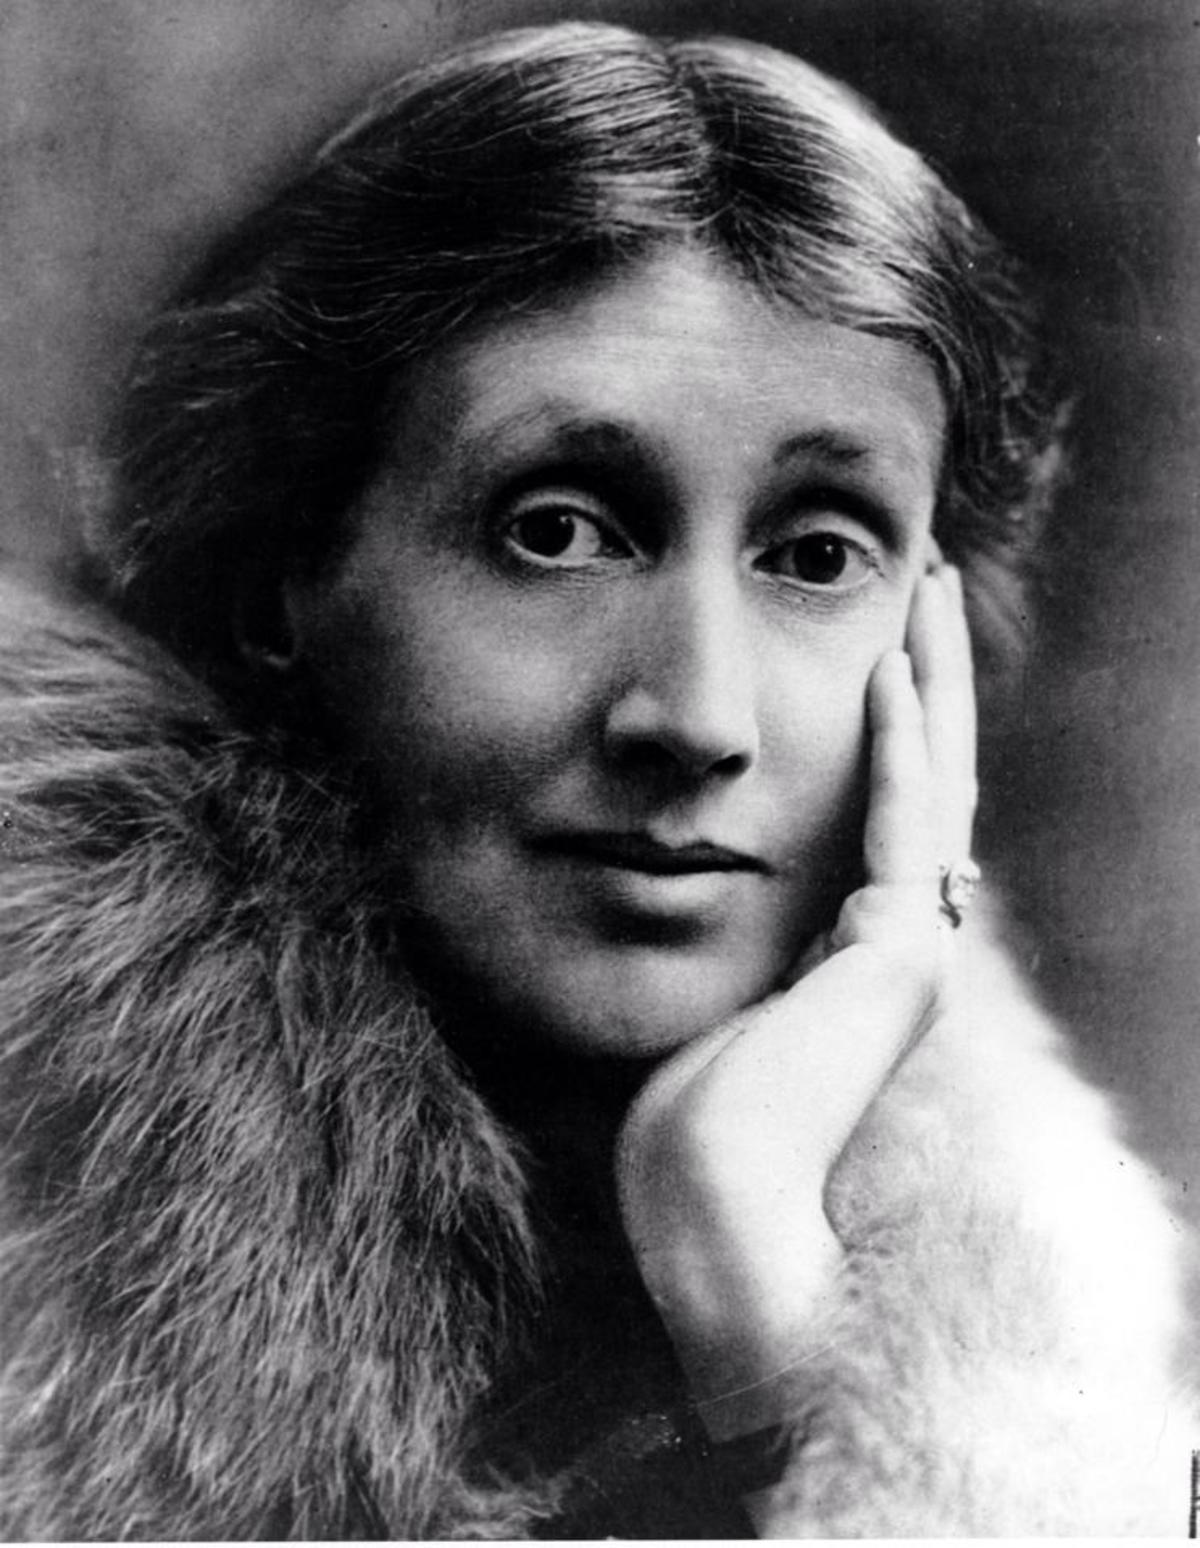 Virginia Woolf chi era?